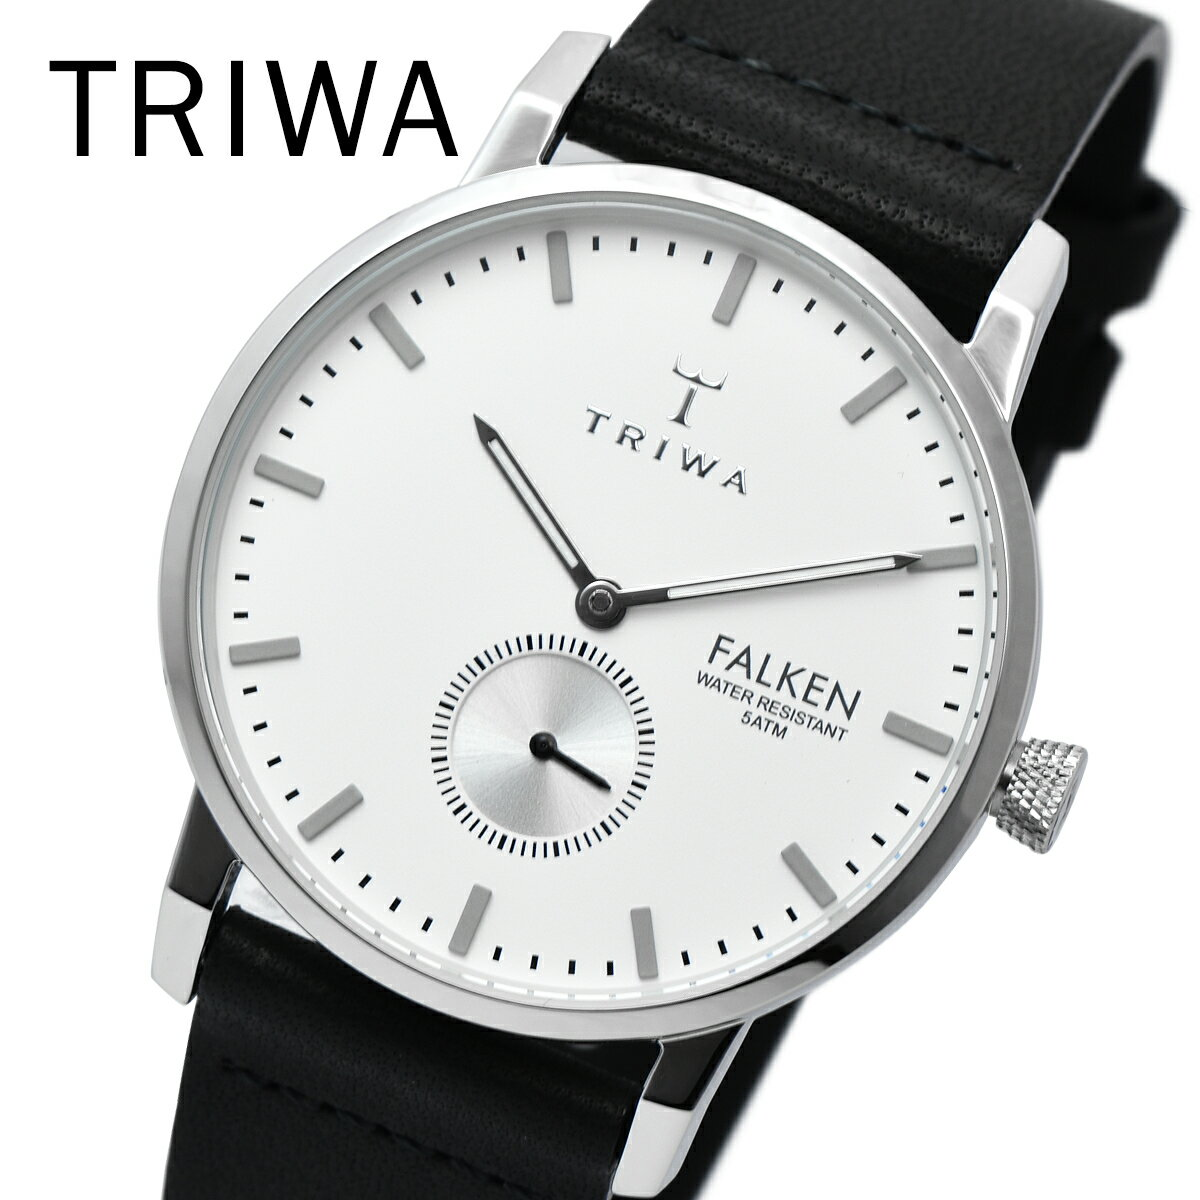 TRIWA トリワ FAST103 CL010112 IVORY FALKEN BLACK メンズ レディース ユニセックス 時計 腕時計 プレゼント 贈り物 ギフト 彼氏 フォーマル カジュアル ペアウォッチ 北欧[あす楽]